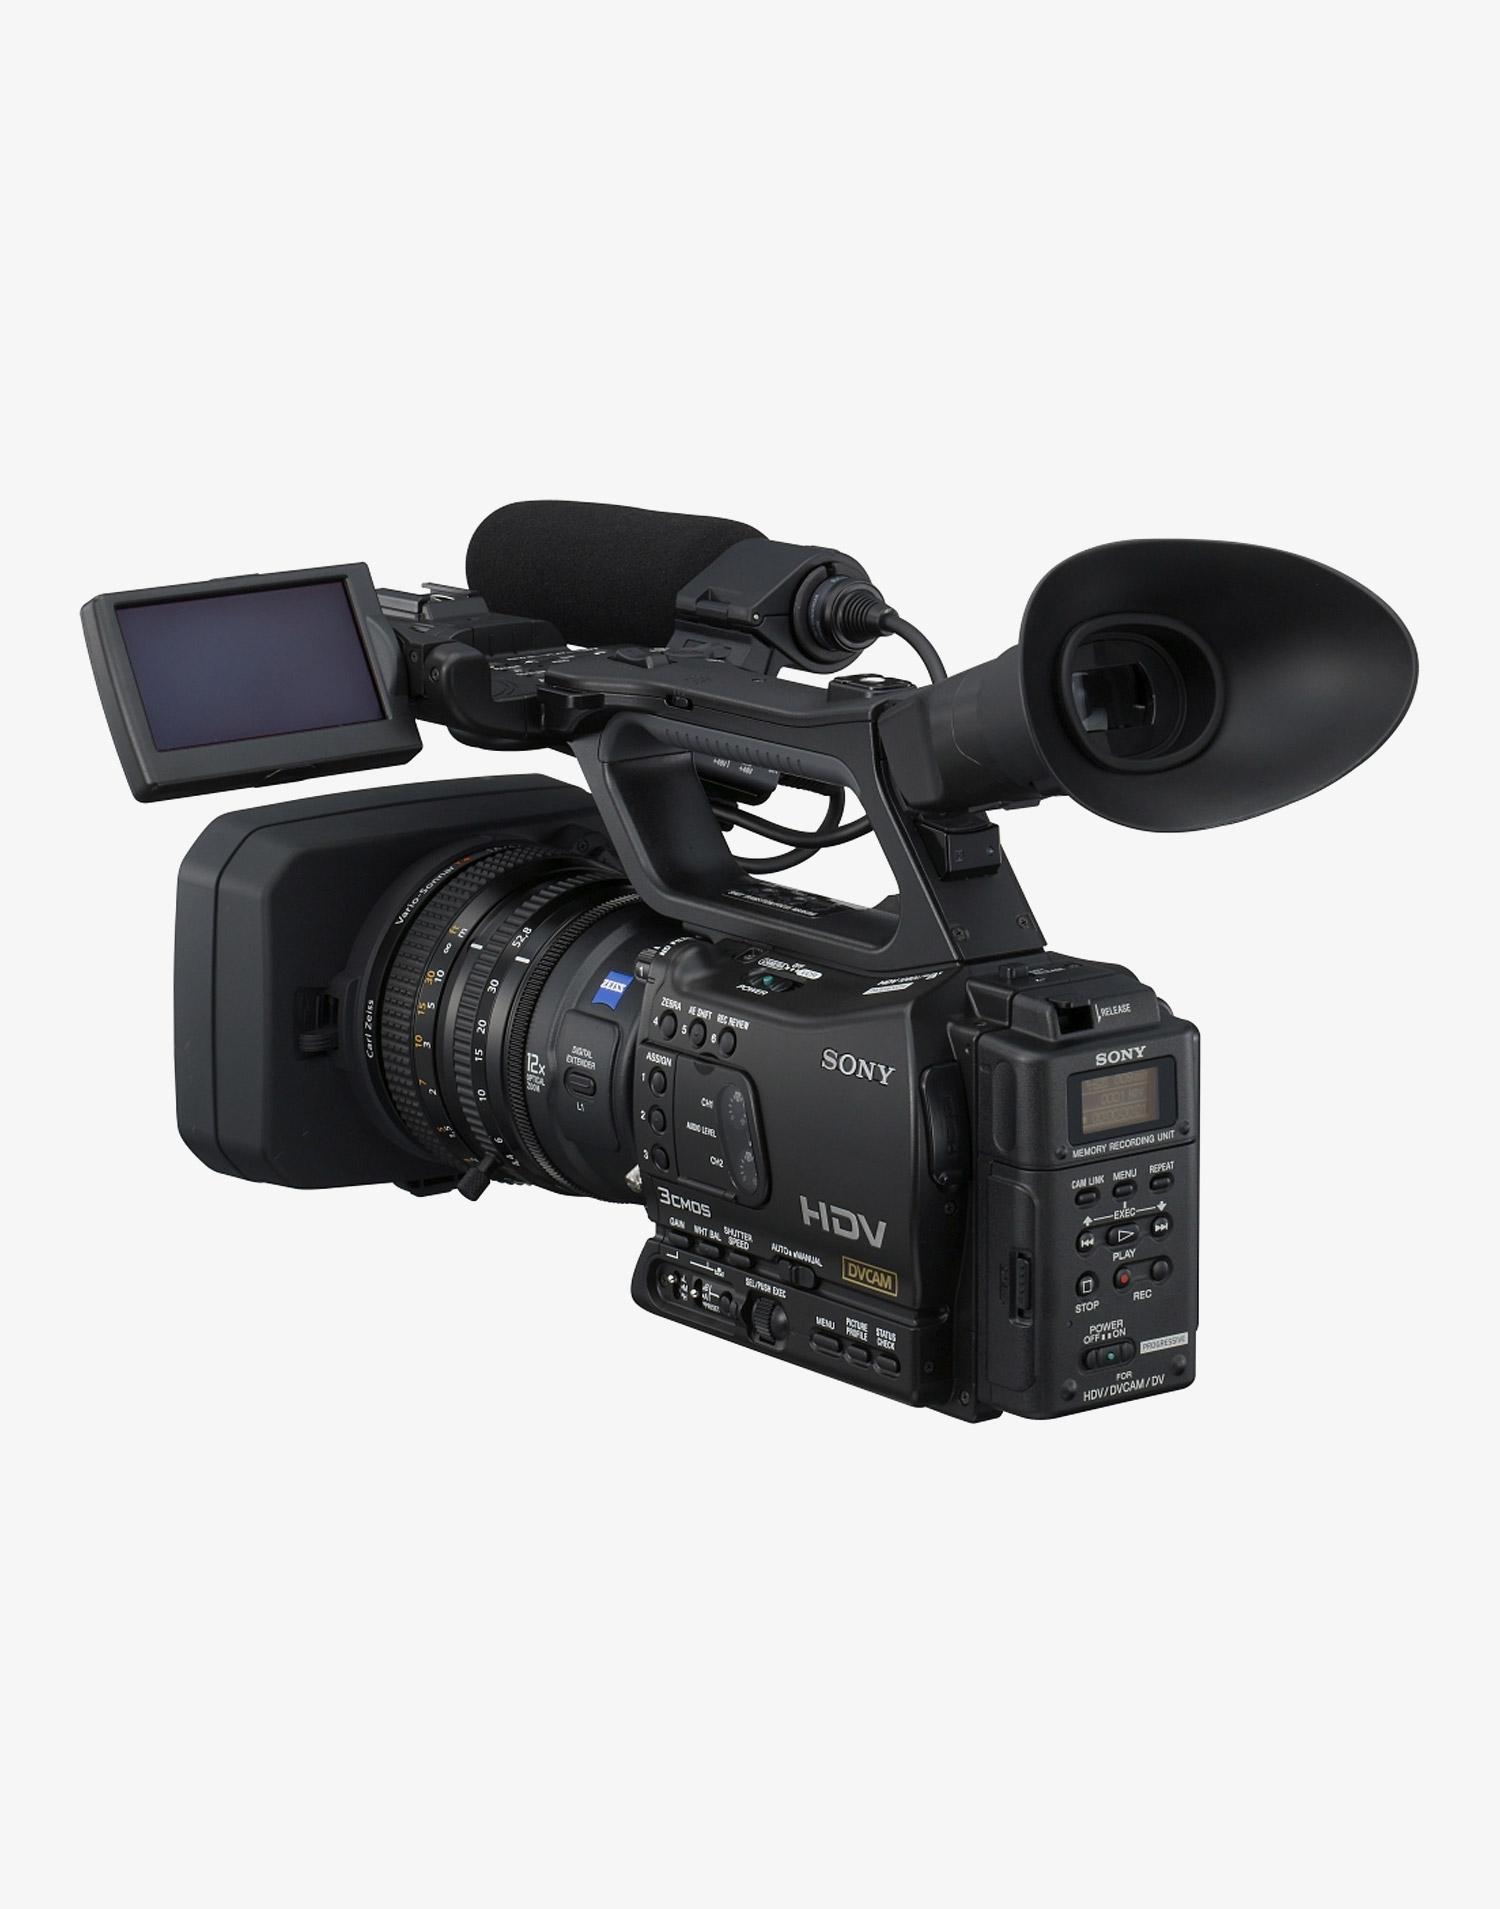 sony z7 film equipment hire ireland rh filmequipmenthire com Sony HVR Z7U HDV Camcorder Sony Z7U Cinema Lens